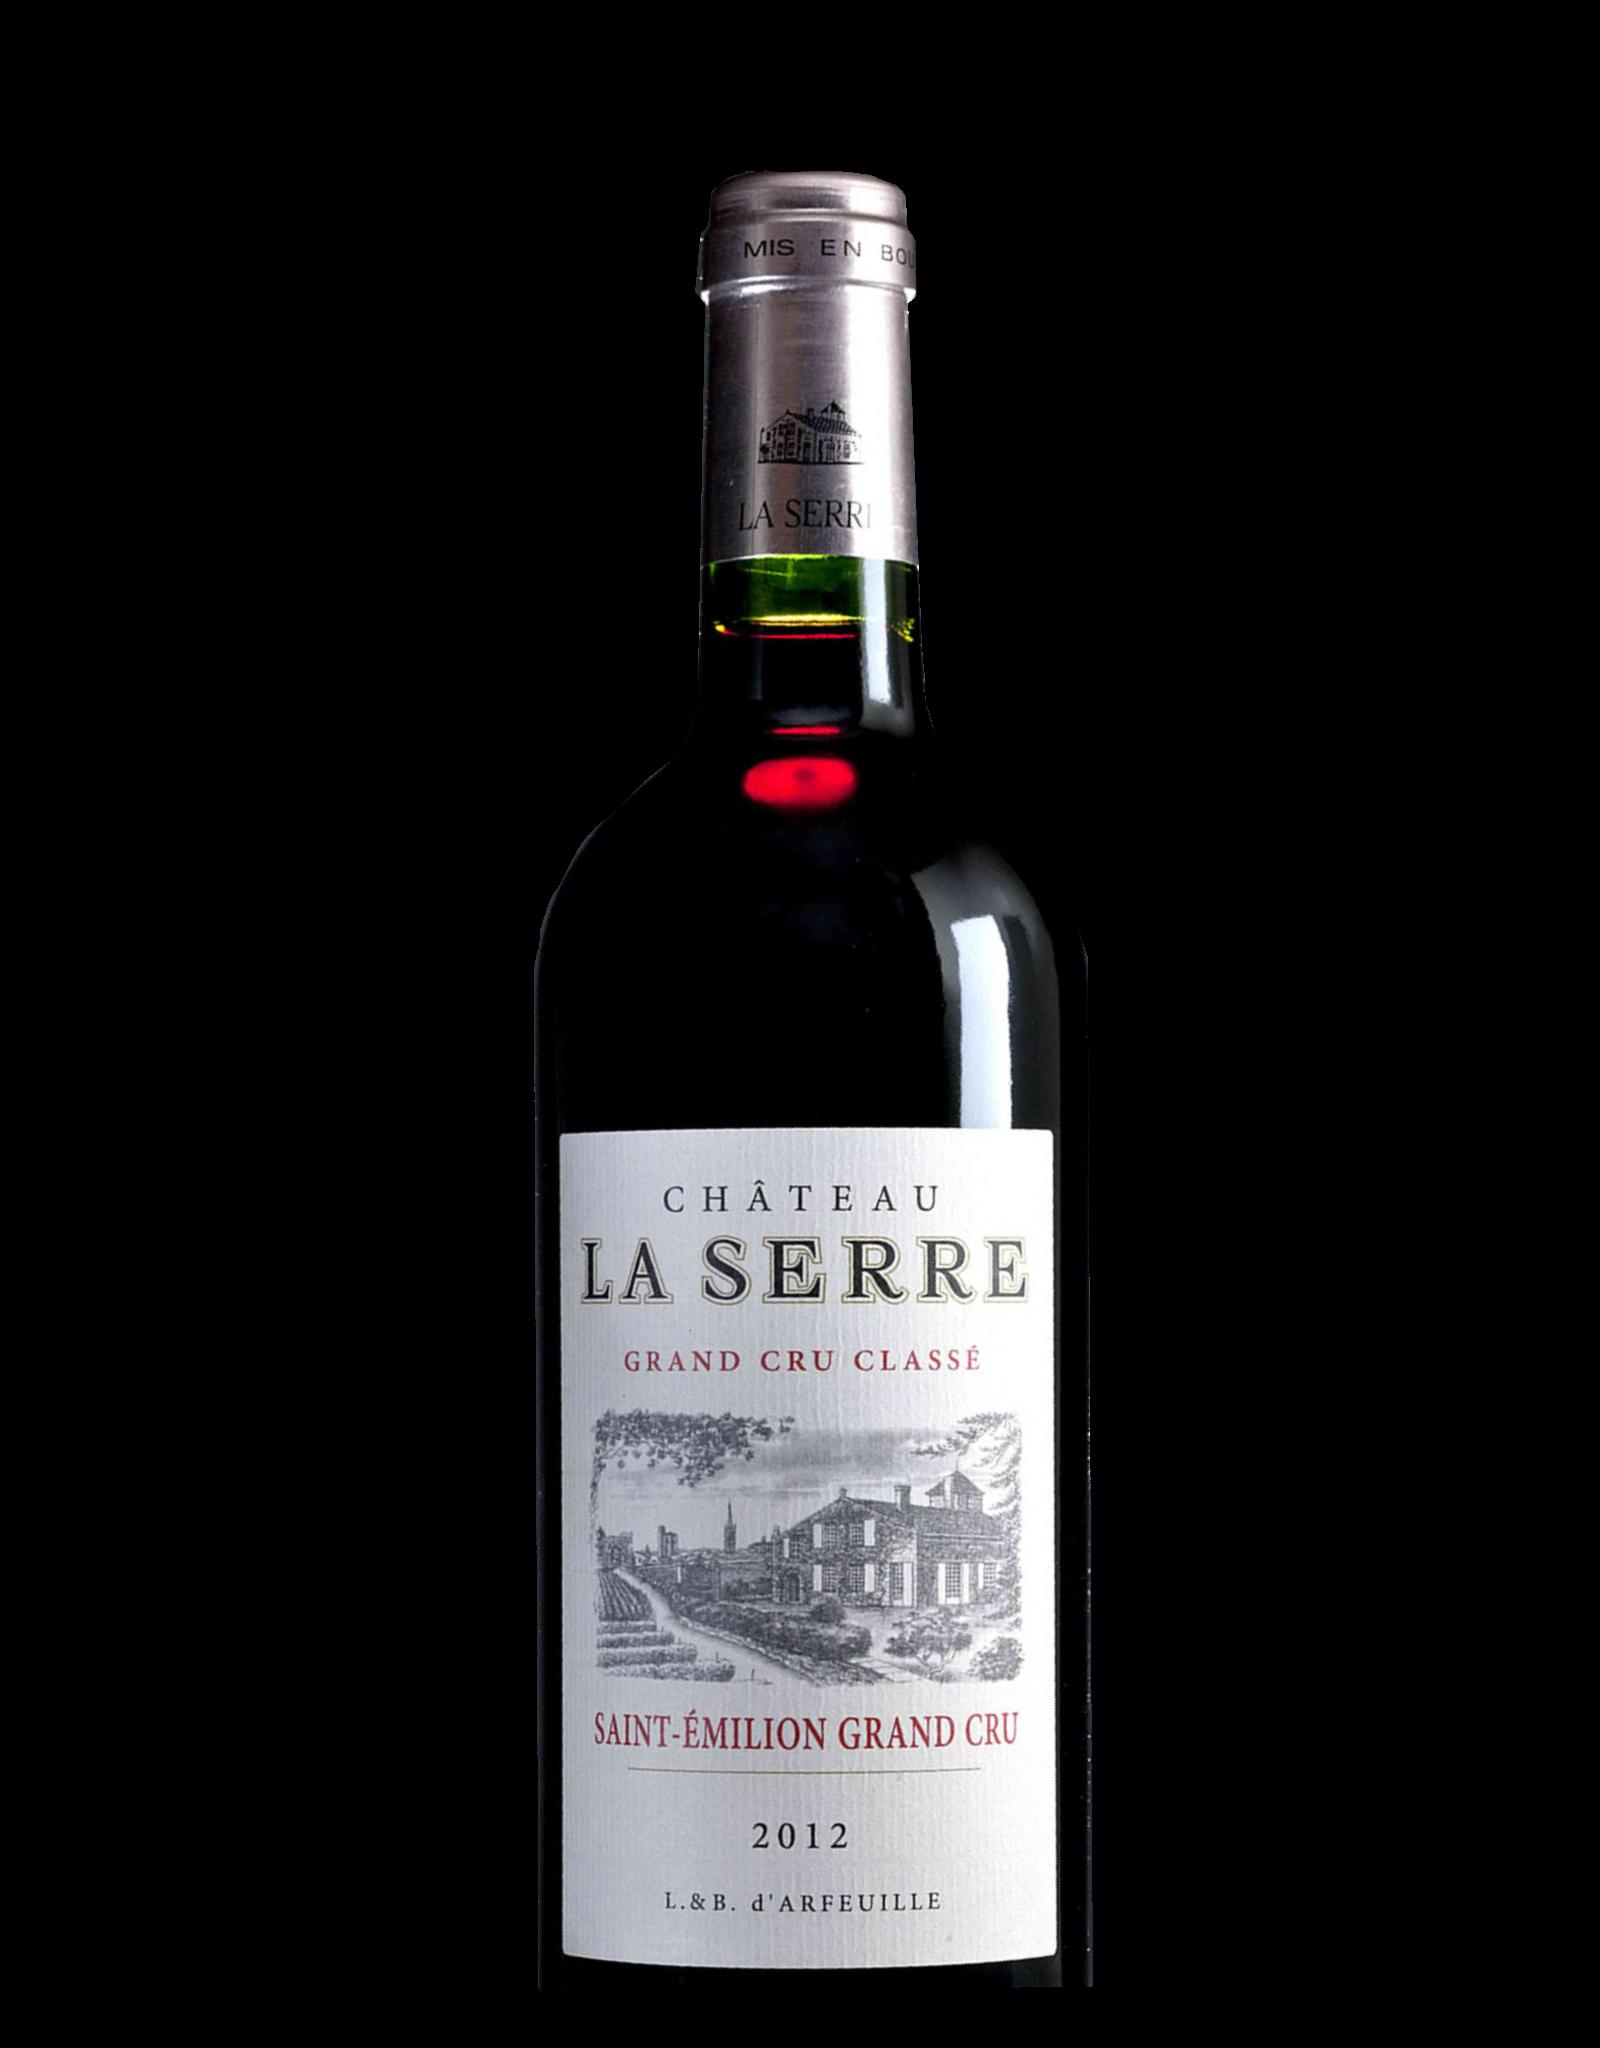 Château La Serre Château La Serre 2018 - St.Emilion